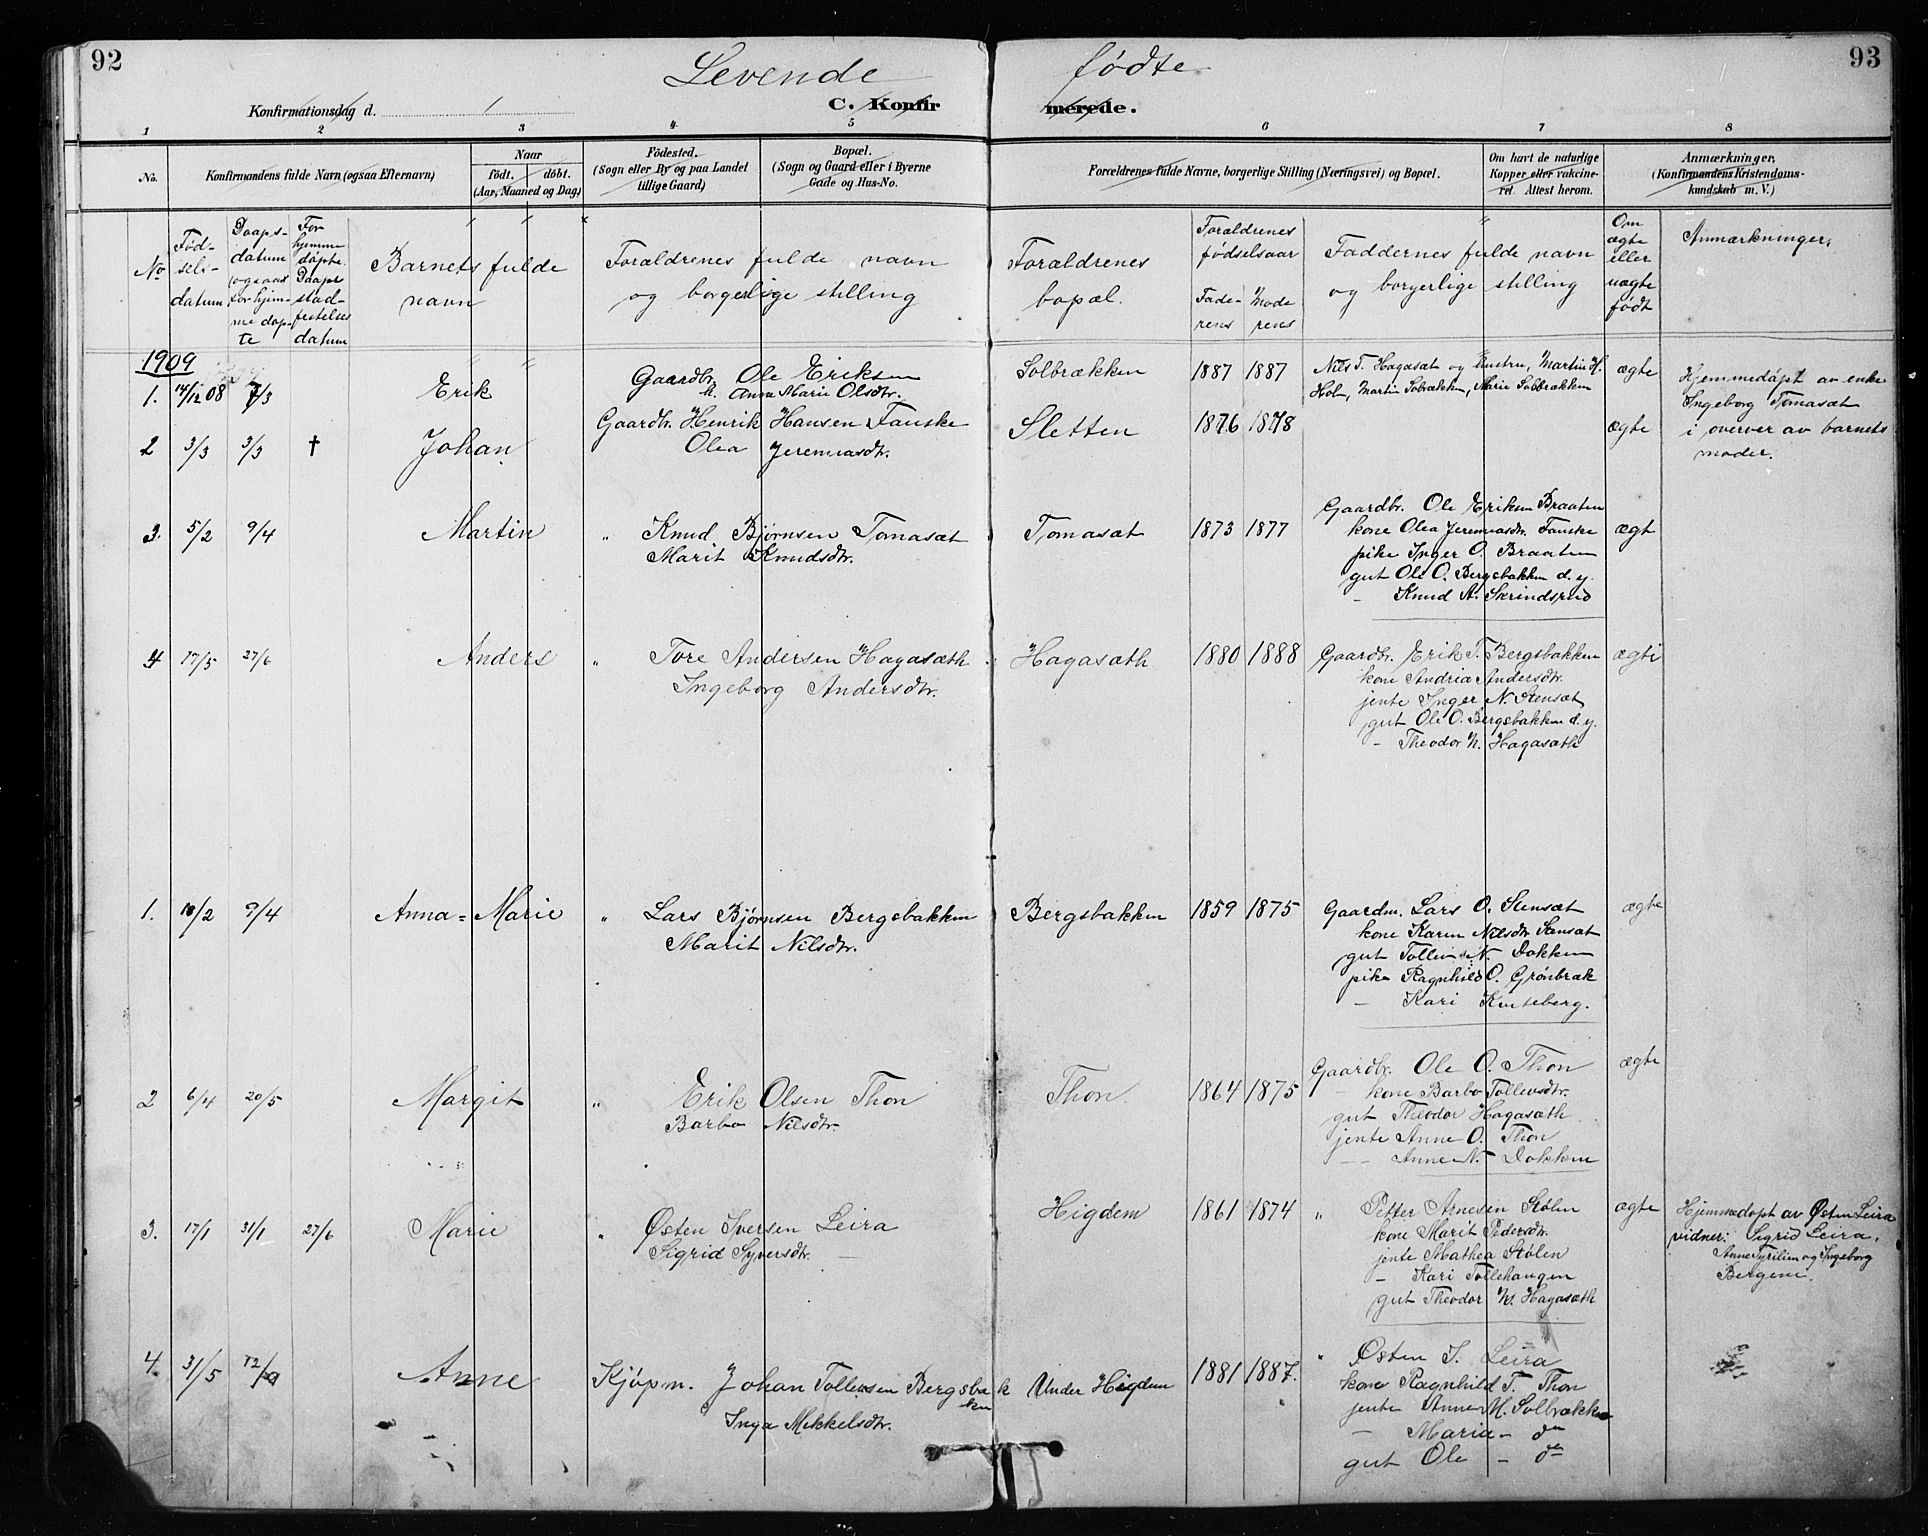 SAH, Etnedal prestekontor, H/Ha/Hab/Habb/L0001: Klokkerbok nr. II 1, 1894-1911, s. 92-93